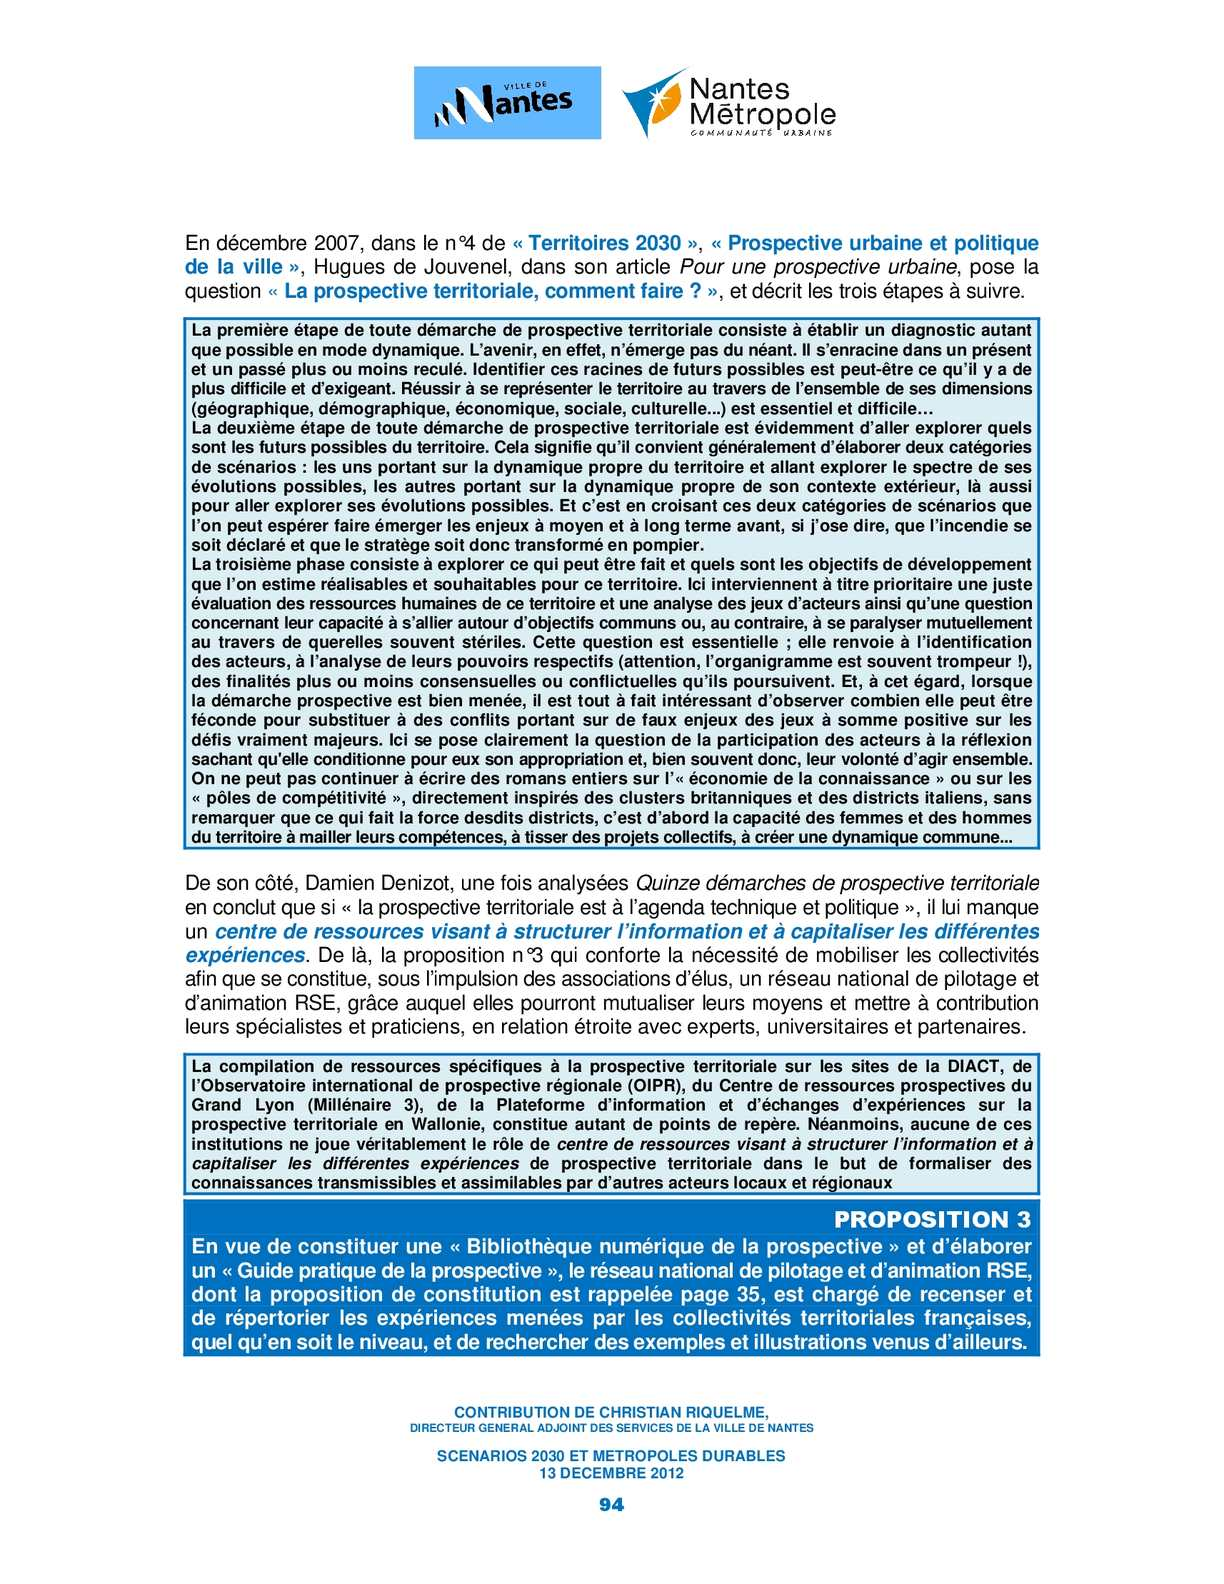 Scenarios 2030 Et Metropoles Durables Calameo Downloader